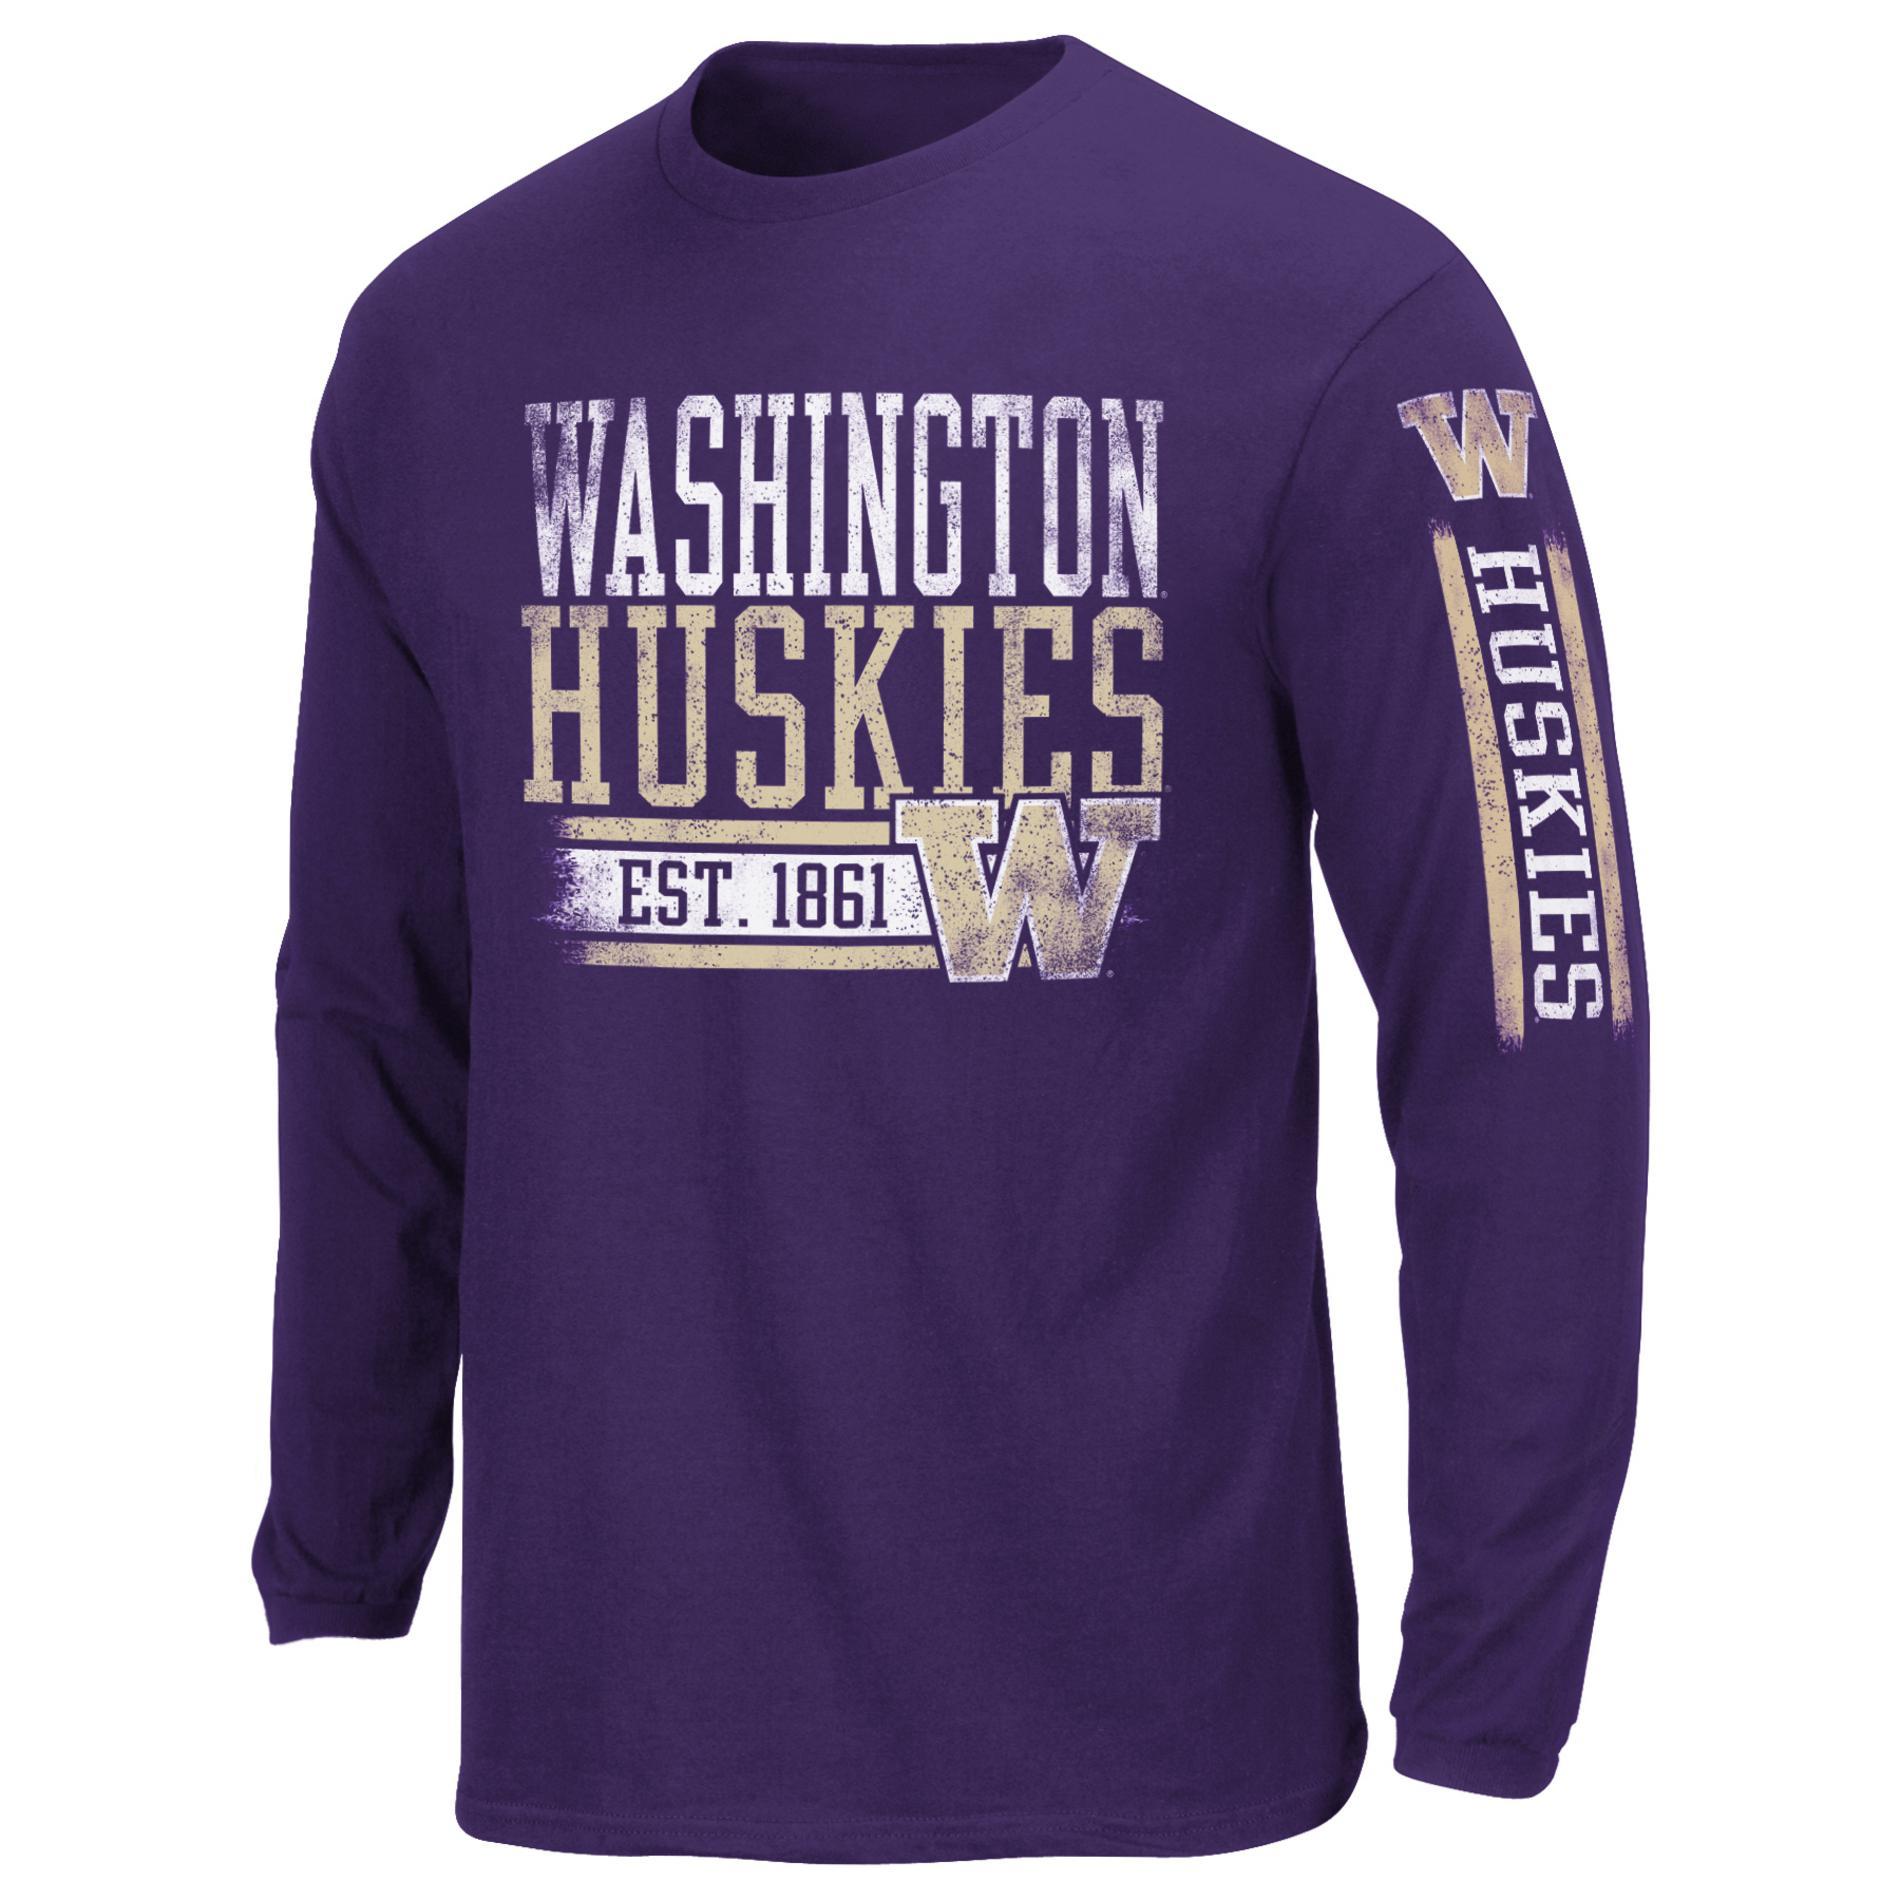 Men's Long-Sleeve T-Shirt - Washington Huskies